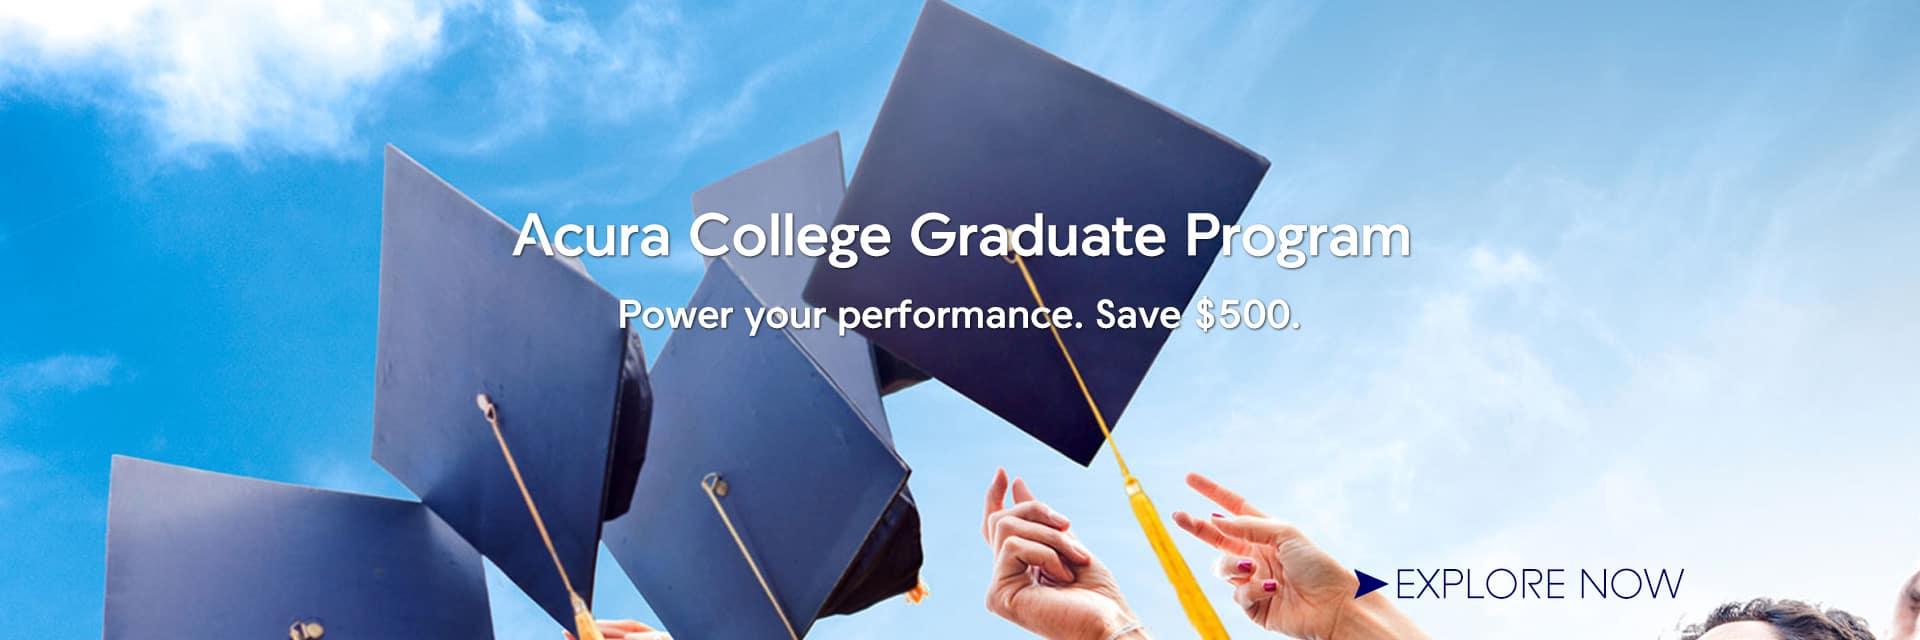 college_graduate_program_1920x640